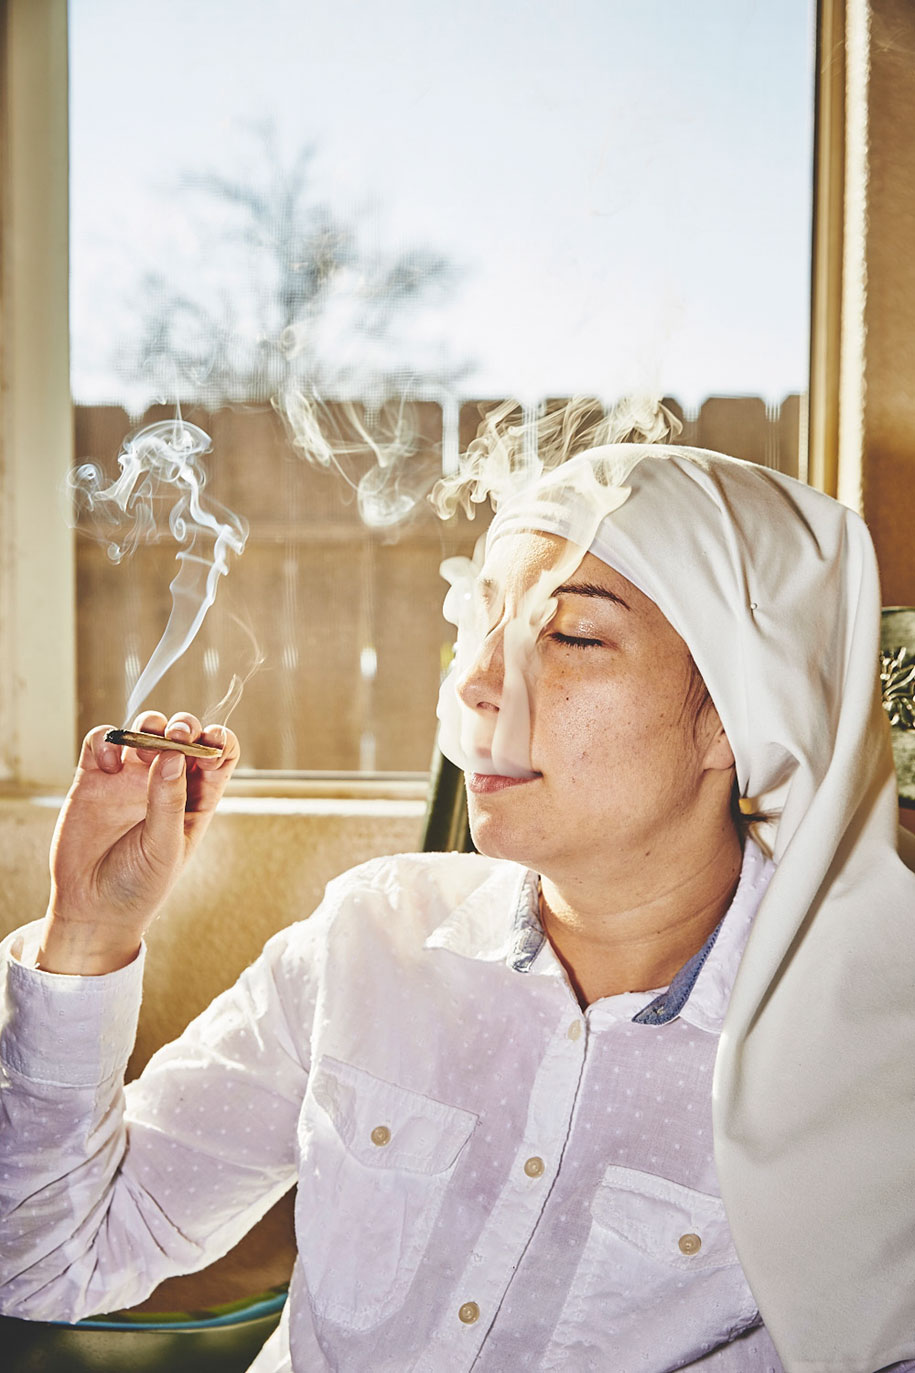 marijuana-horticulture-sisters-of-the-valley-shaughn-crawford-john-dubois-23